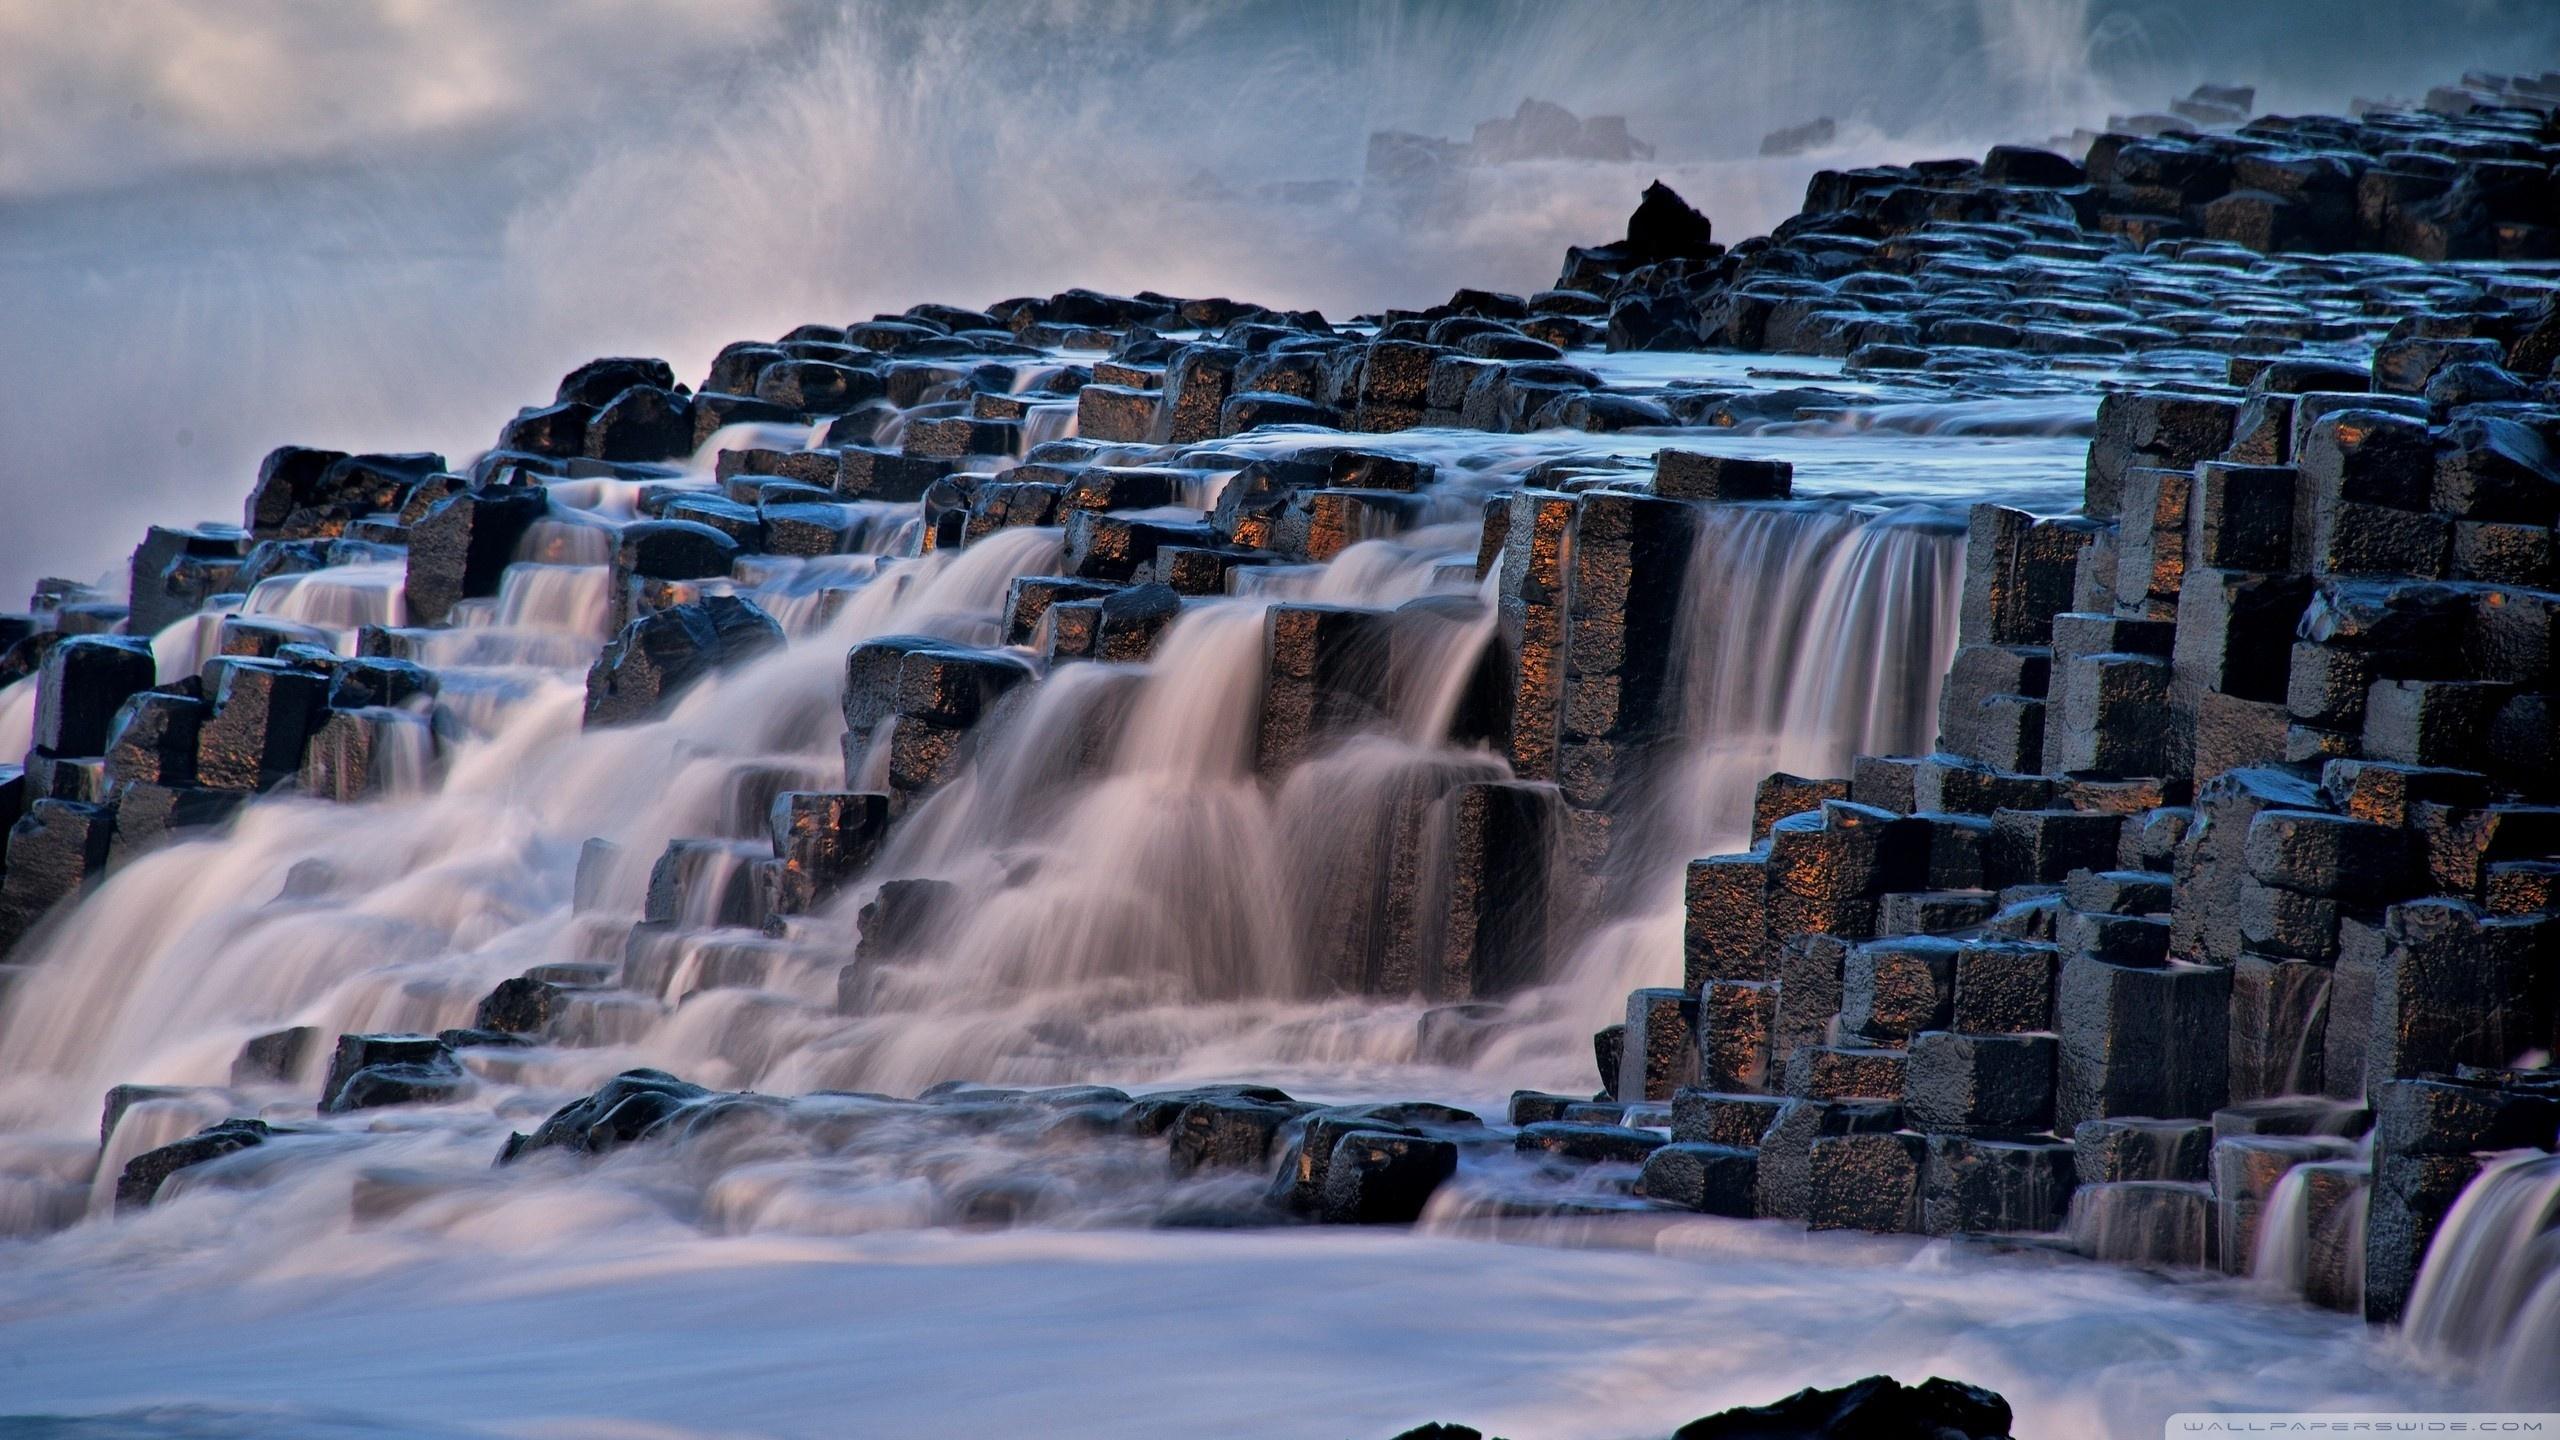 Giants Causeway Antrim Northern Ireland 4K HD Desktop Wallpaper 2560x1440